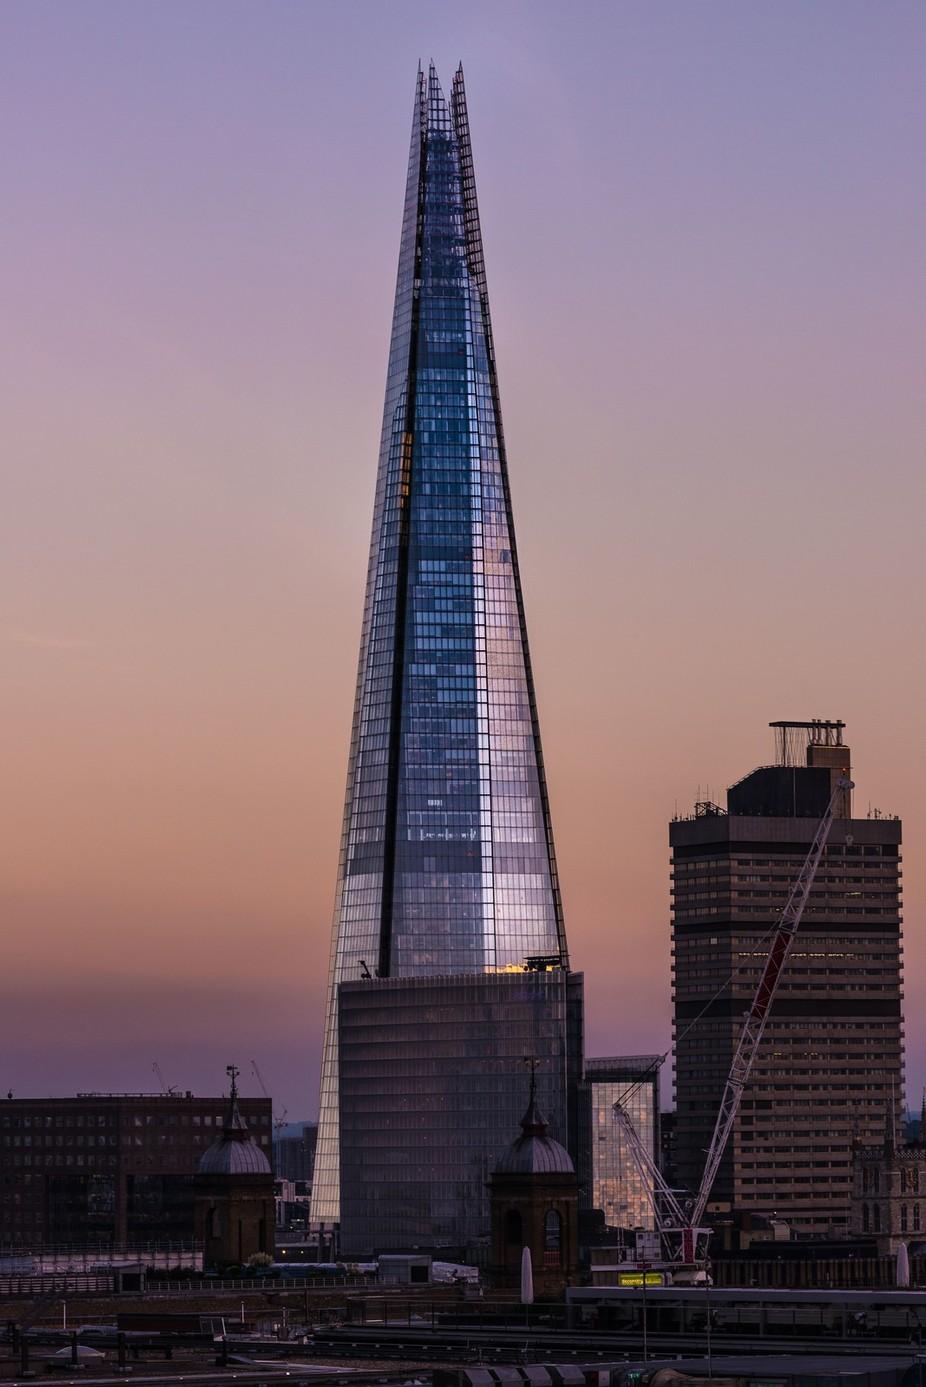 Shard London by FullexposureUK - Large Photo Contest